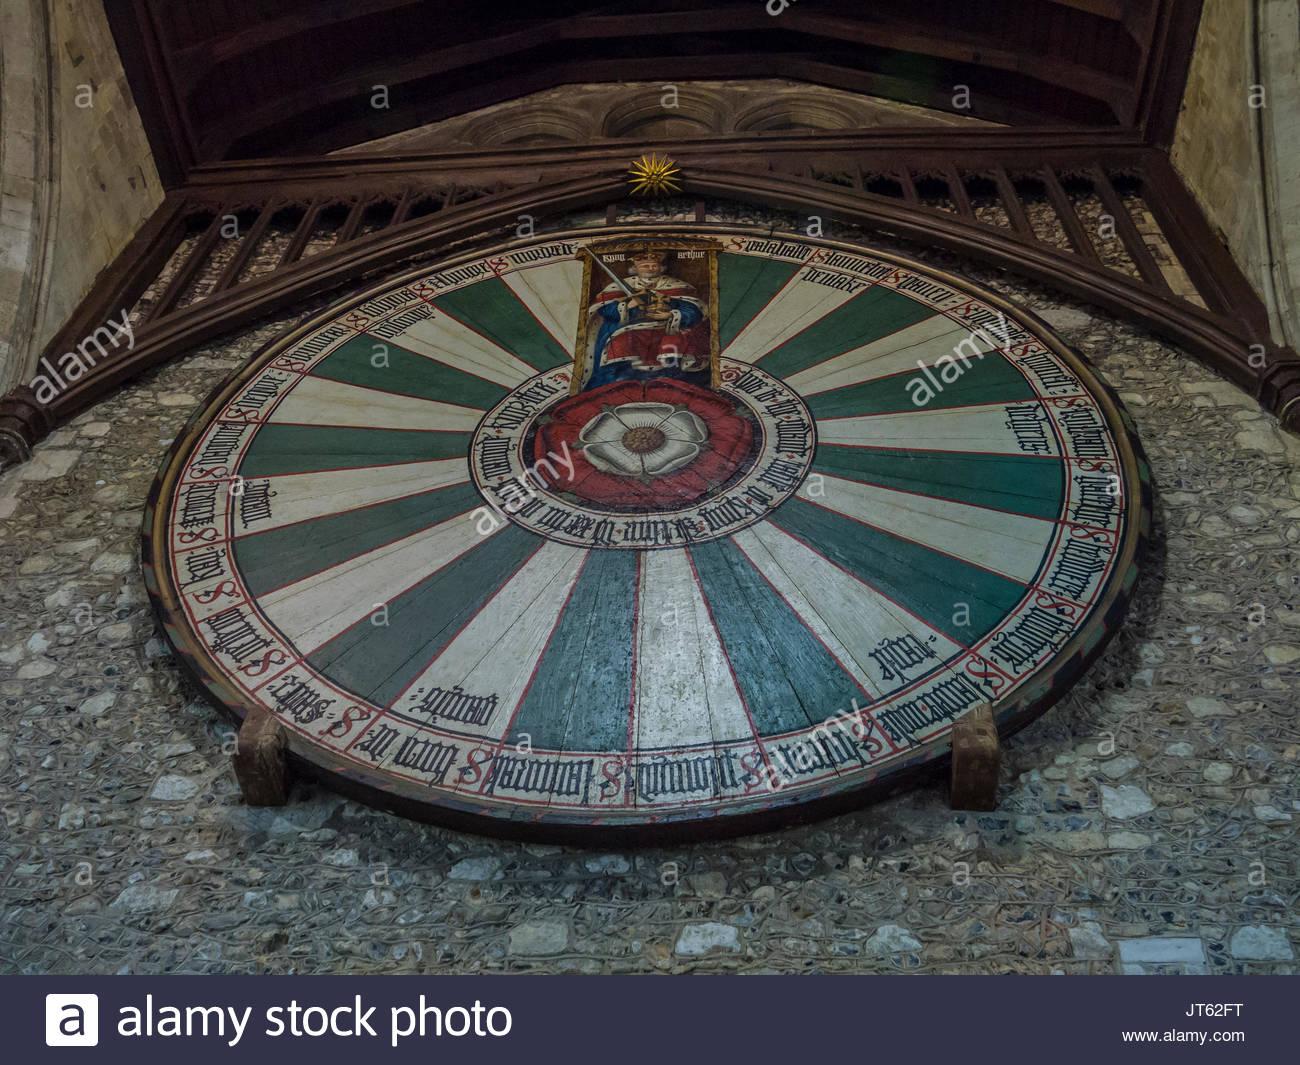 König Artus Tafelrunde, Hängen in den Großen Saal Winchester, Stockbild